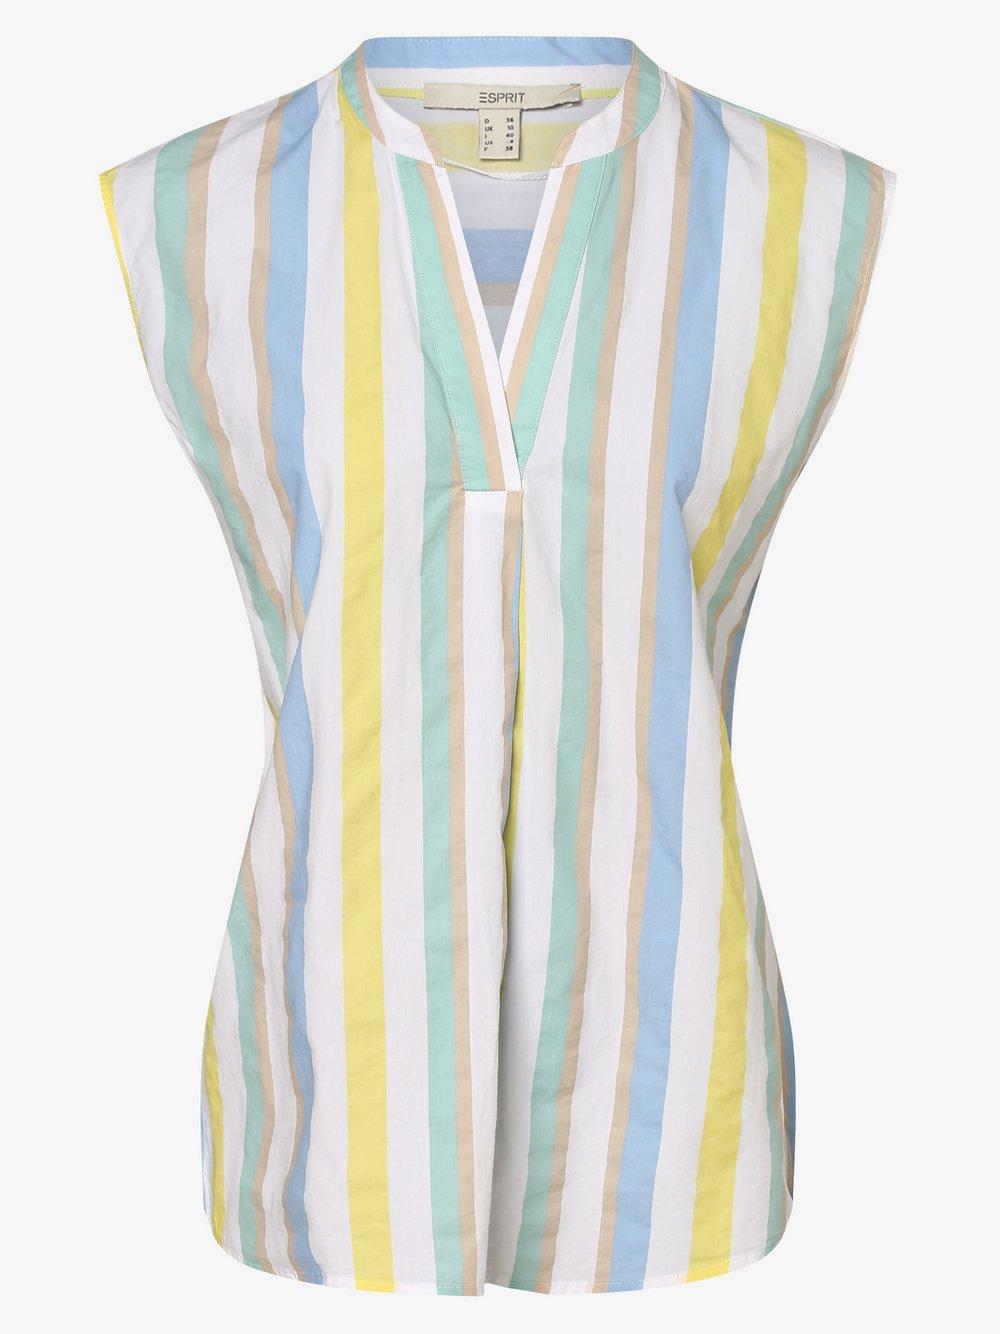 Esprit Casual – Damska bluzka bez rękawów, biały Van Graaf 473964-0001-00380